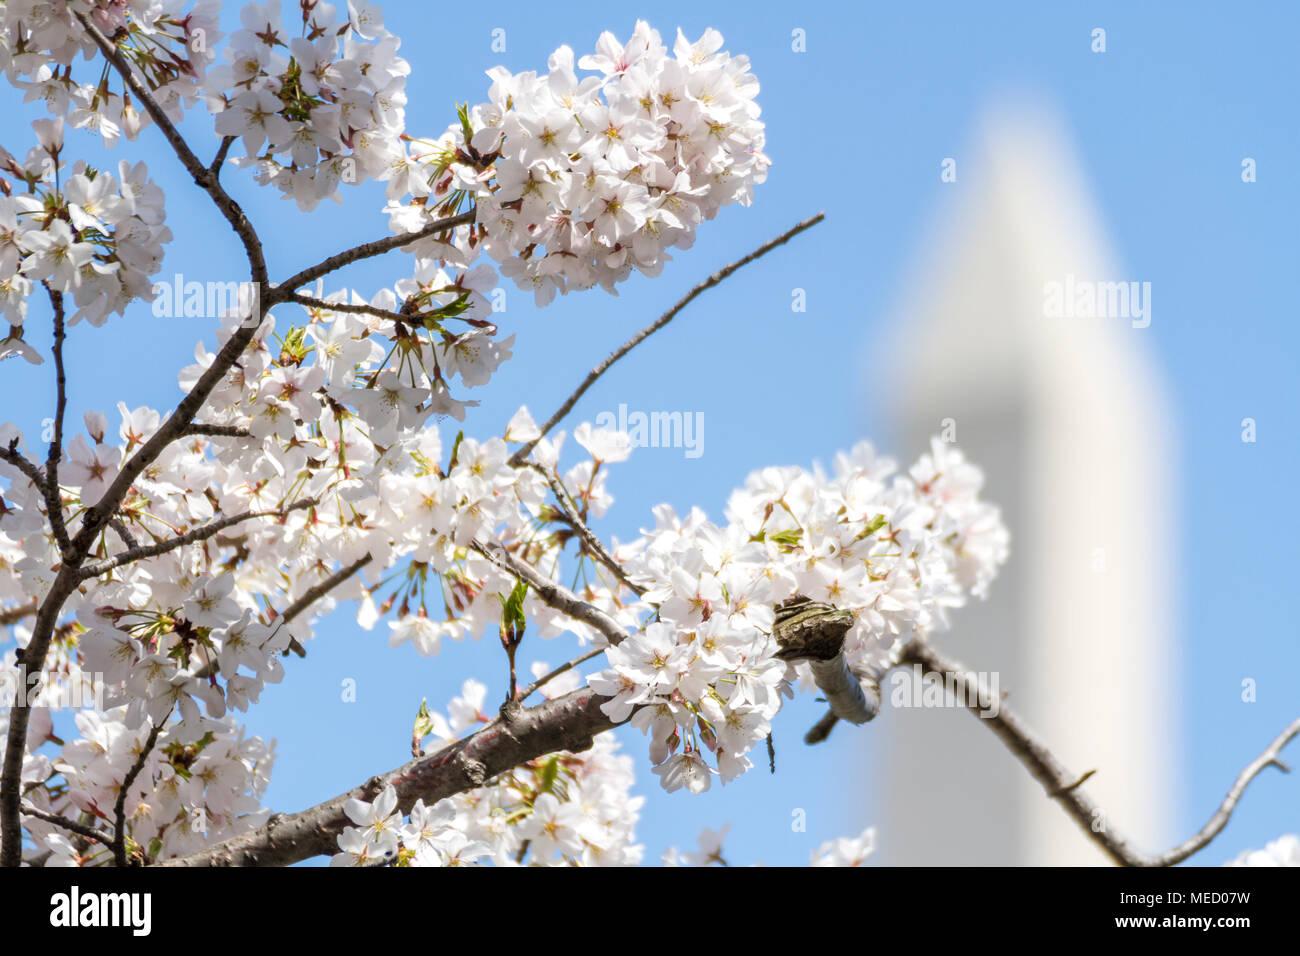 Cherry Blossom Washington Dc Usa Pride Imágenes De Stock & Cherry ...